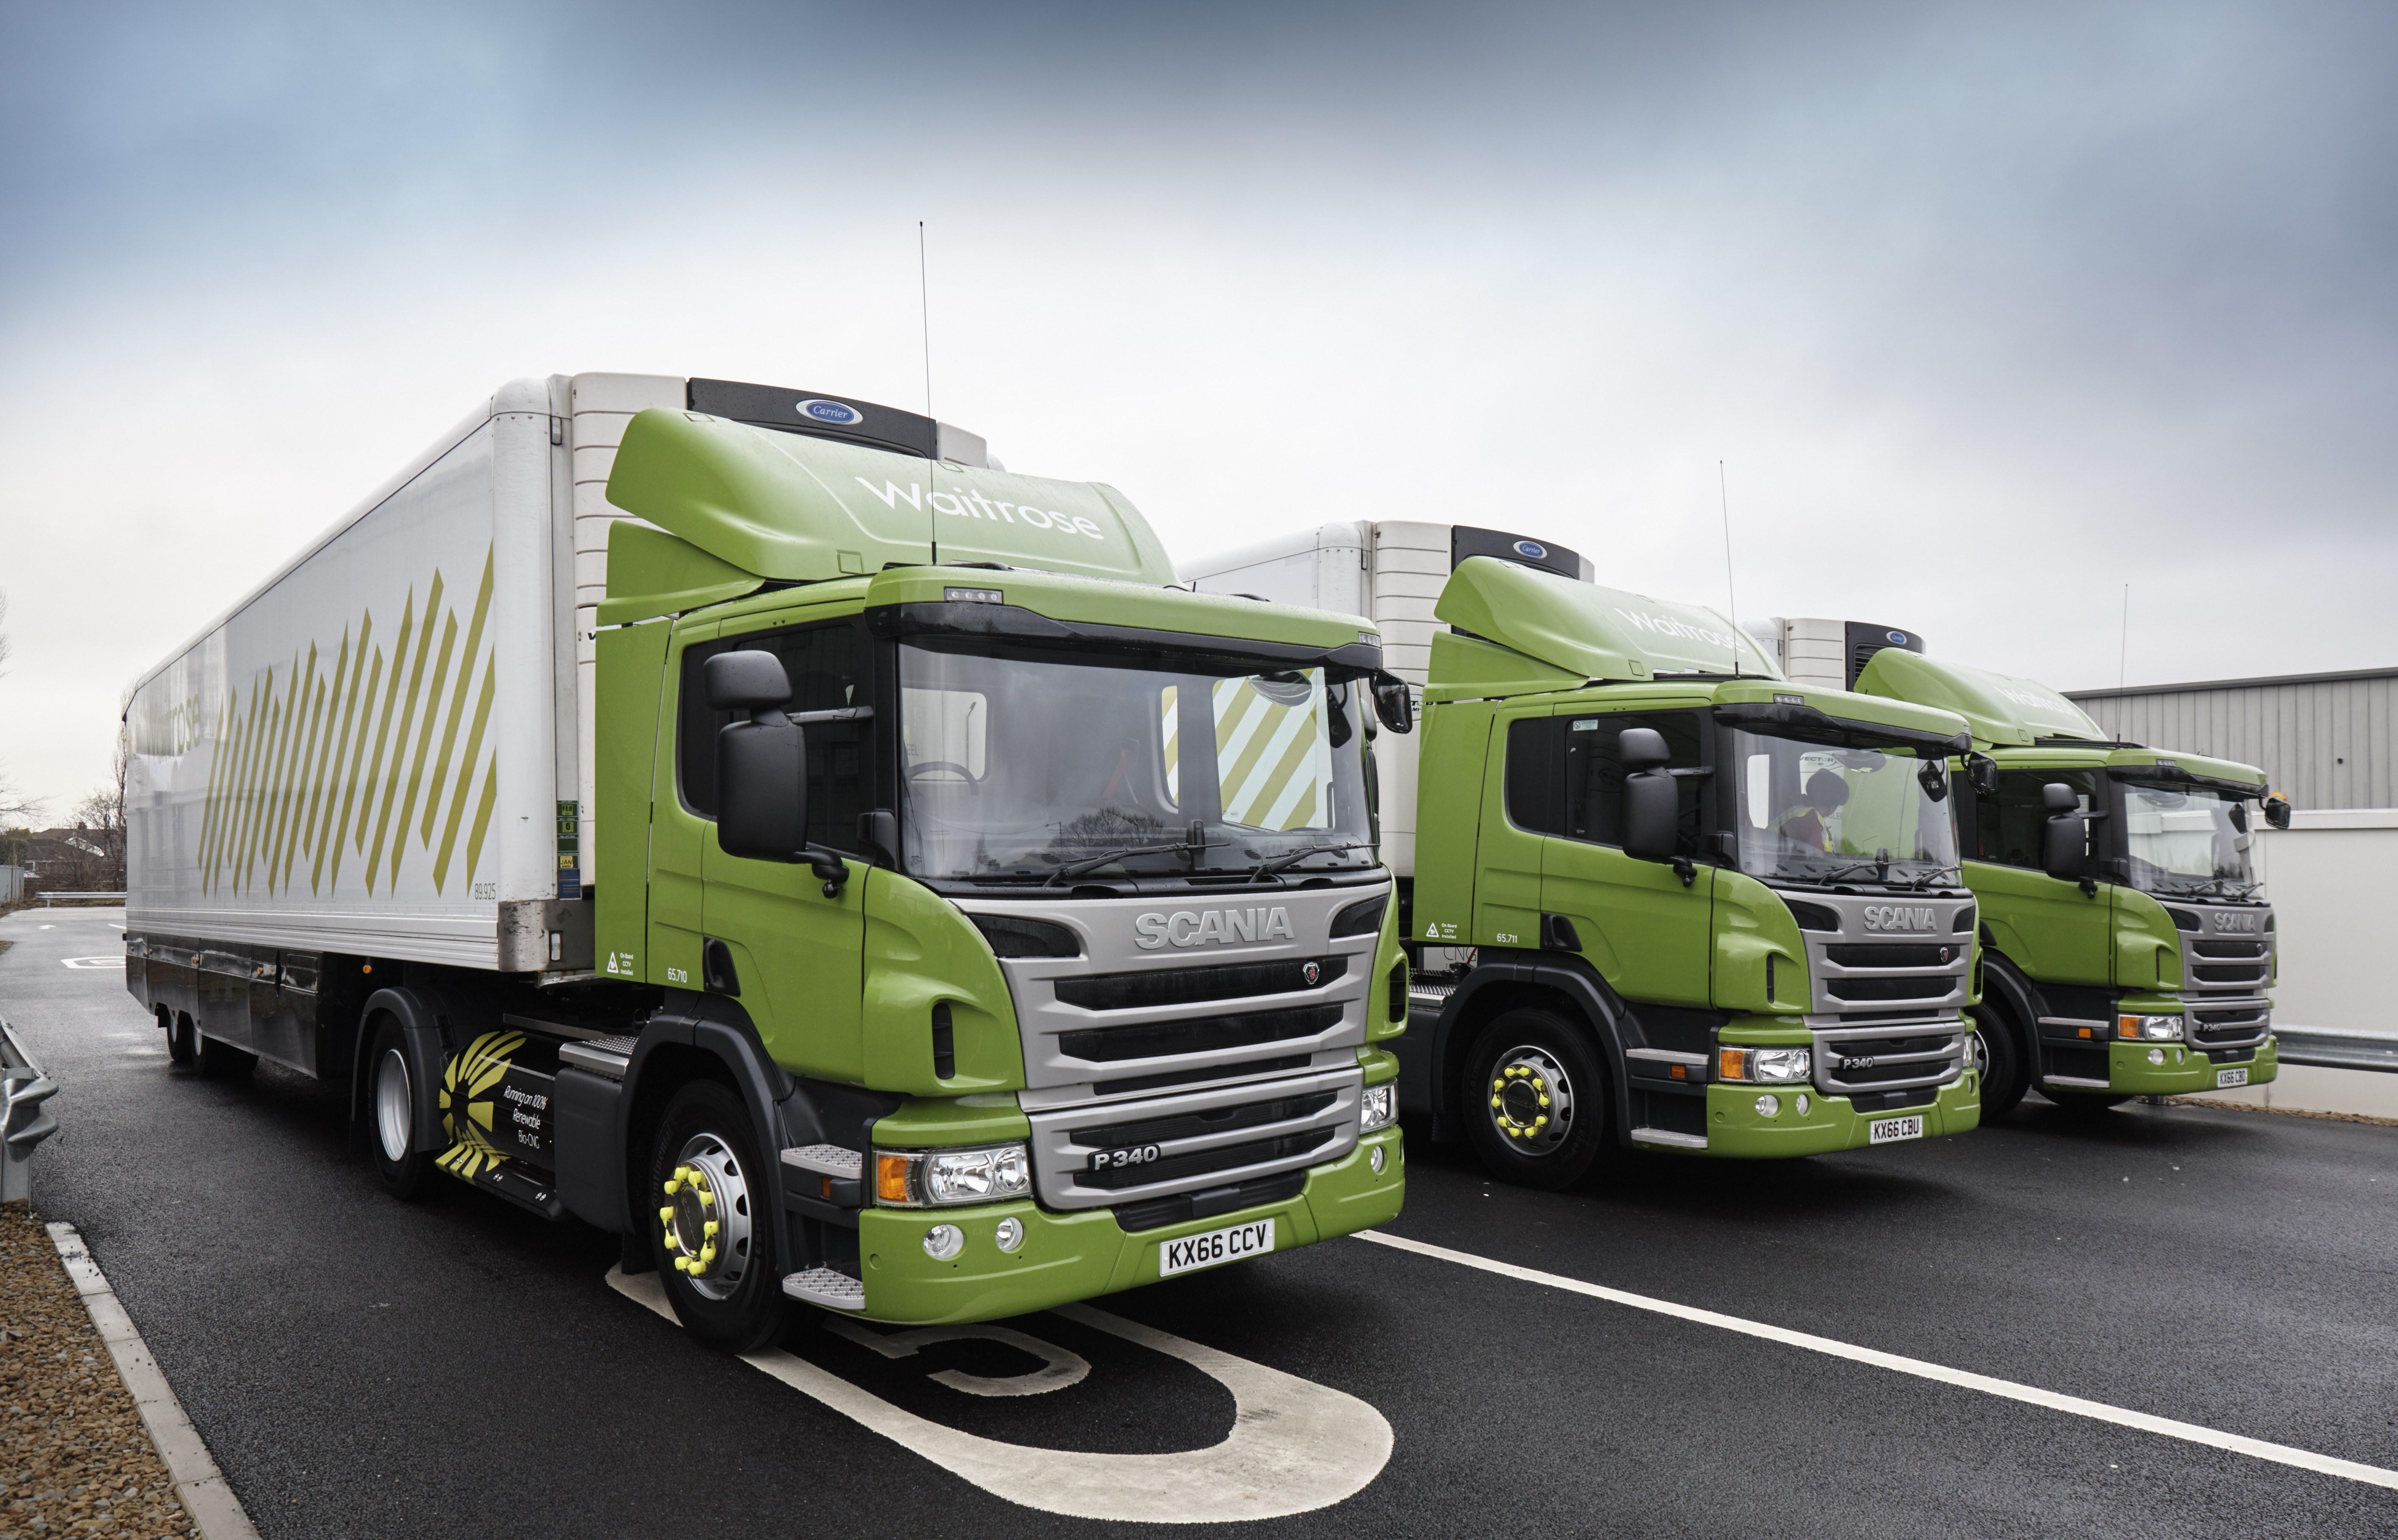 Waitrose Reveals New Cng Truck Fleet The Engineer The